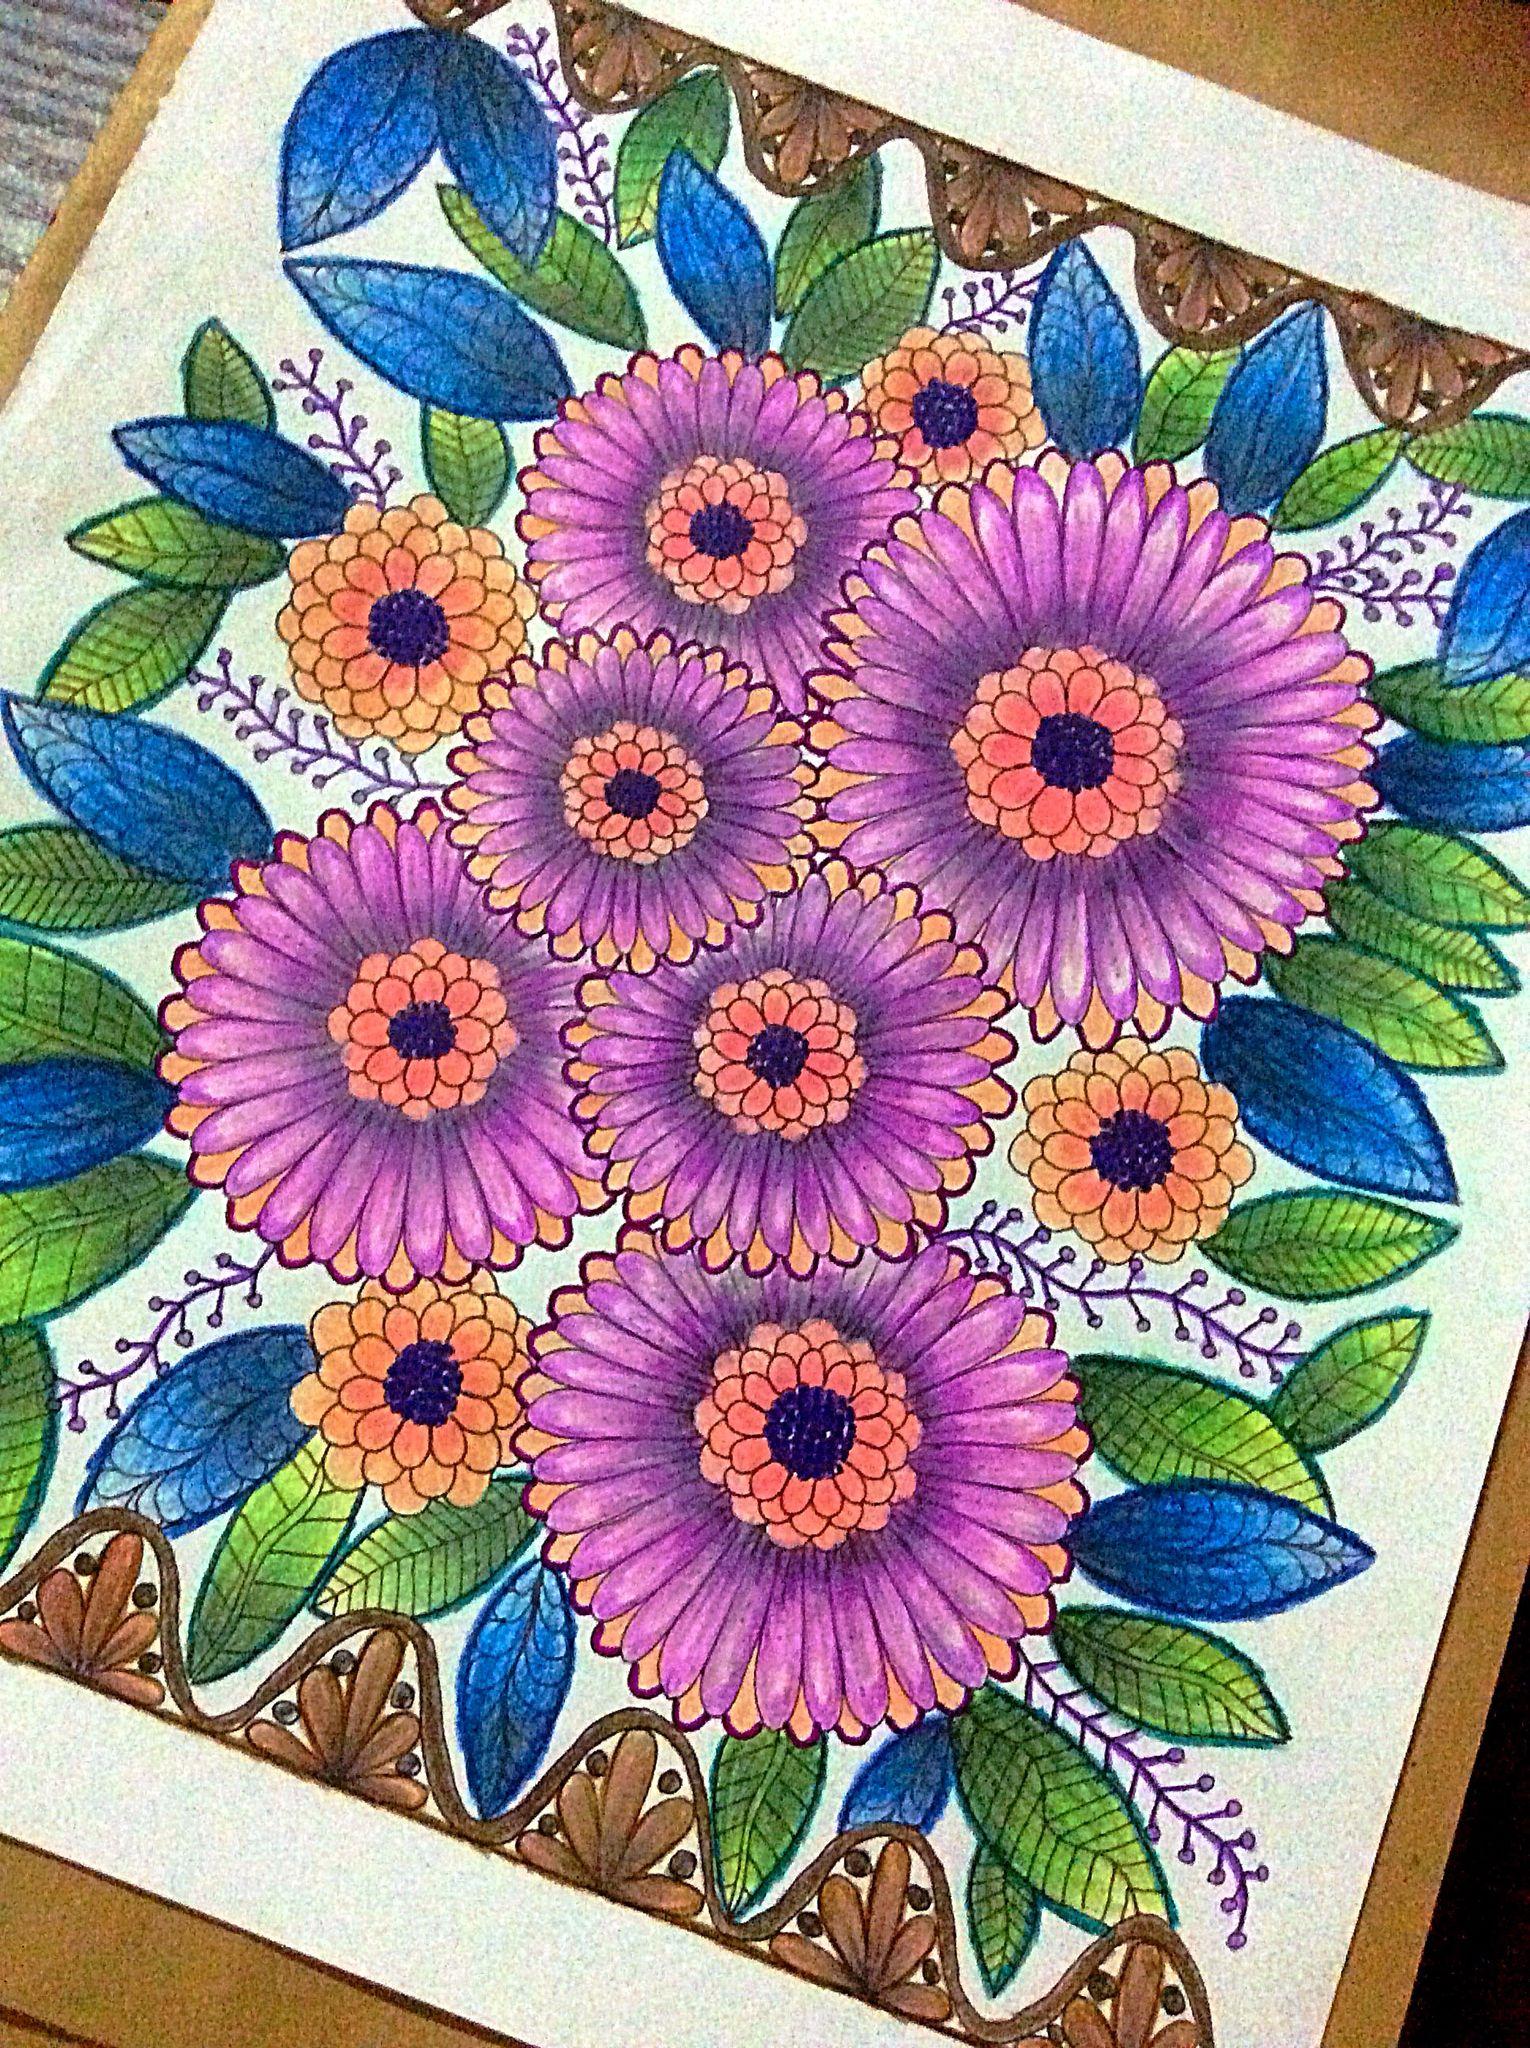 Zendoodle coloring enchanting gardens - Zendoodle Enchanting Gardens Faber Castel Derwent Colousoft Pentel And Stabilo